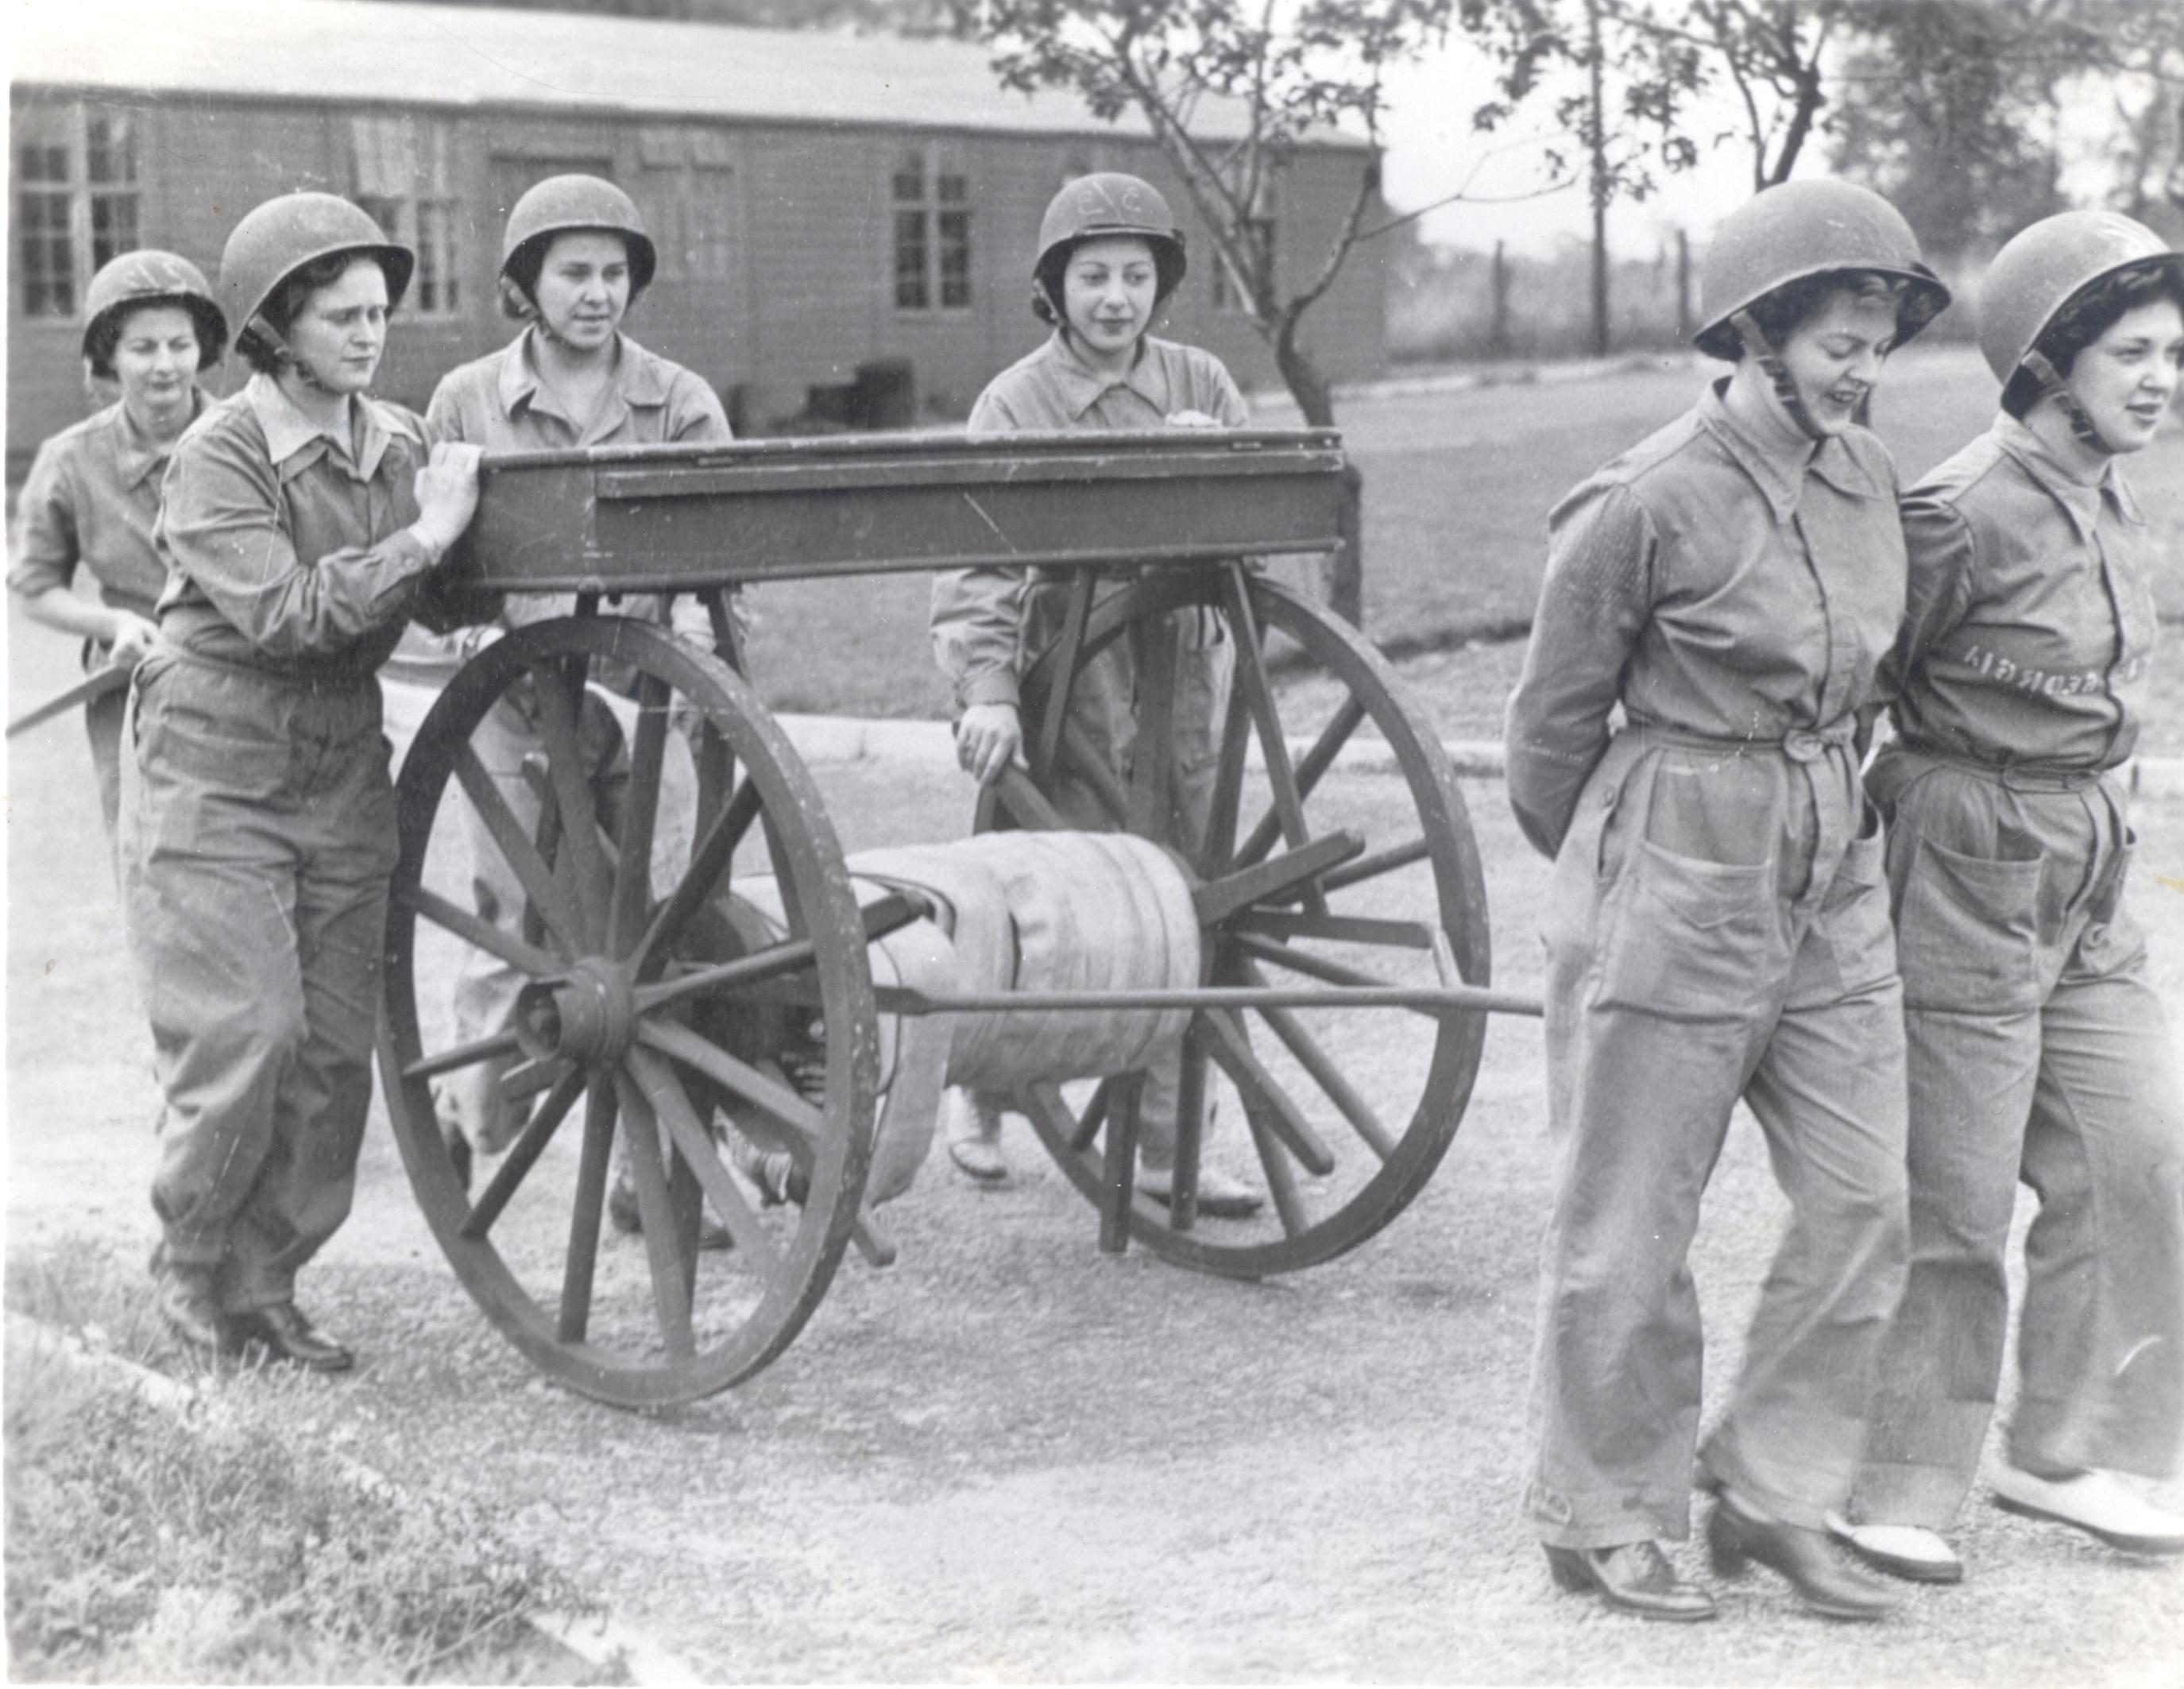 http://norfolksamericanconnections.files.wordpress.com/2012/02/american-womens-army-corps.jpg